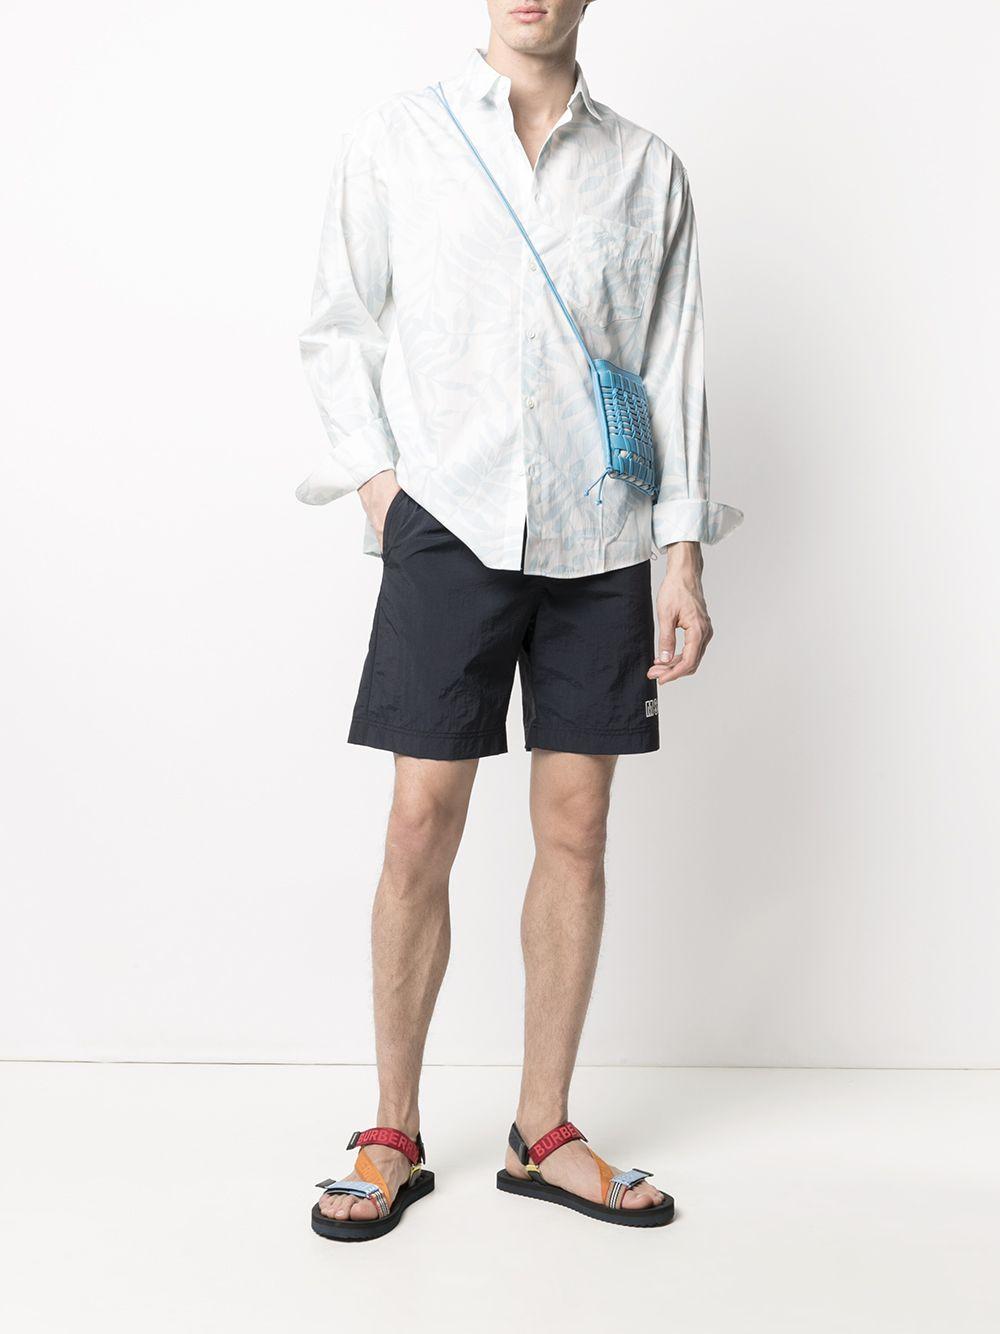 SANTON FOLIAGE PRINT SHIRT JACQUEMUS | Shirts | 215SH01PRINT BLUE LEAVES